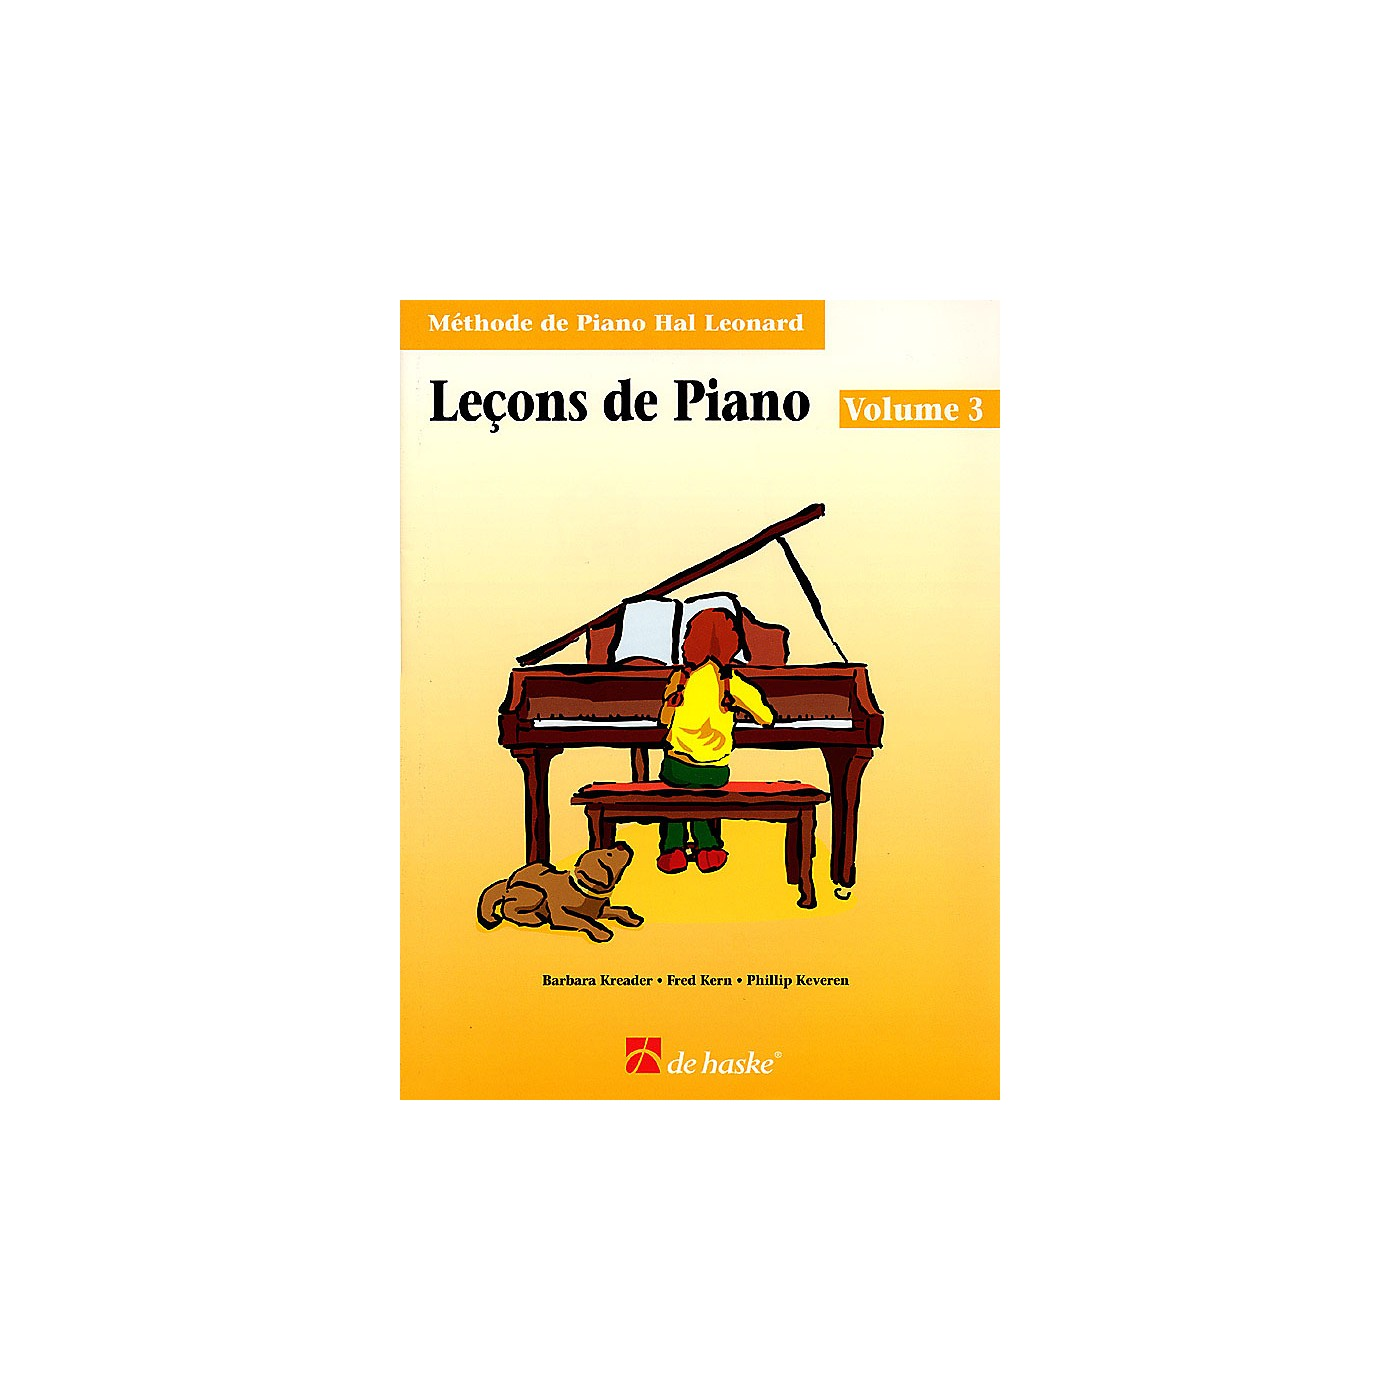 Hal Leonard Piano Lessons Book 3 - French Edition Education Piano Lib French Ed Series Written by Barbara Kreader thumbnail